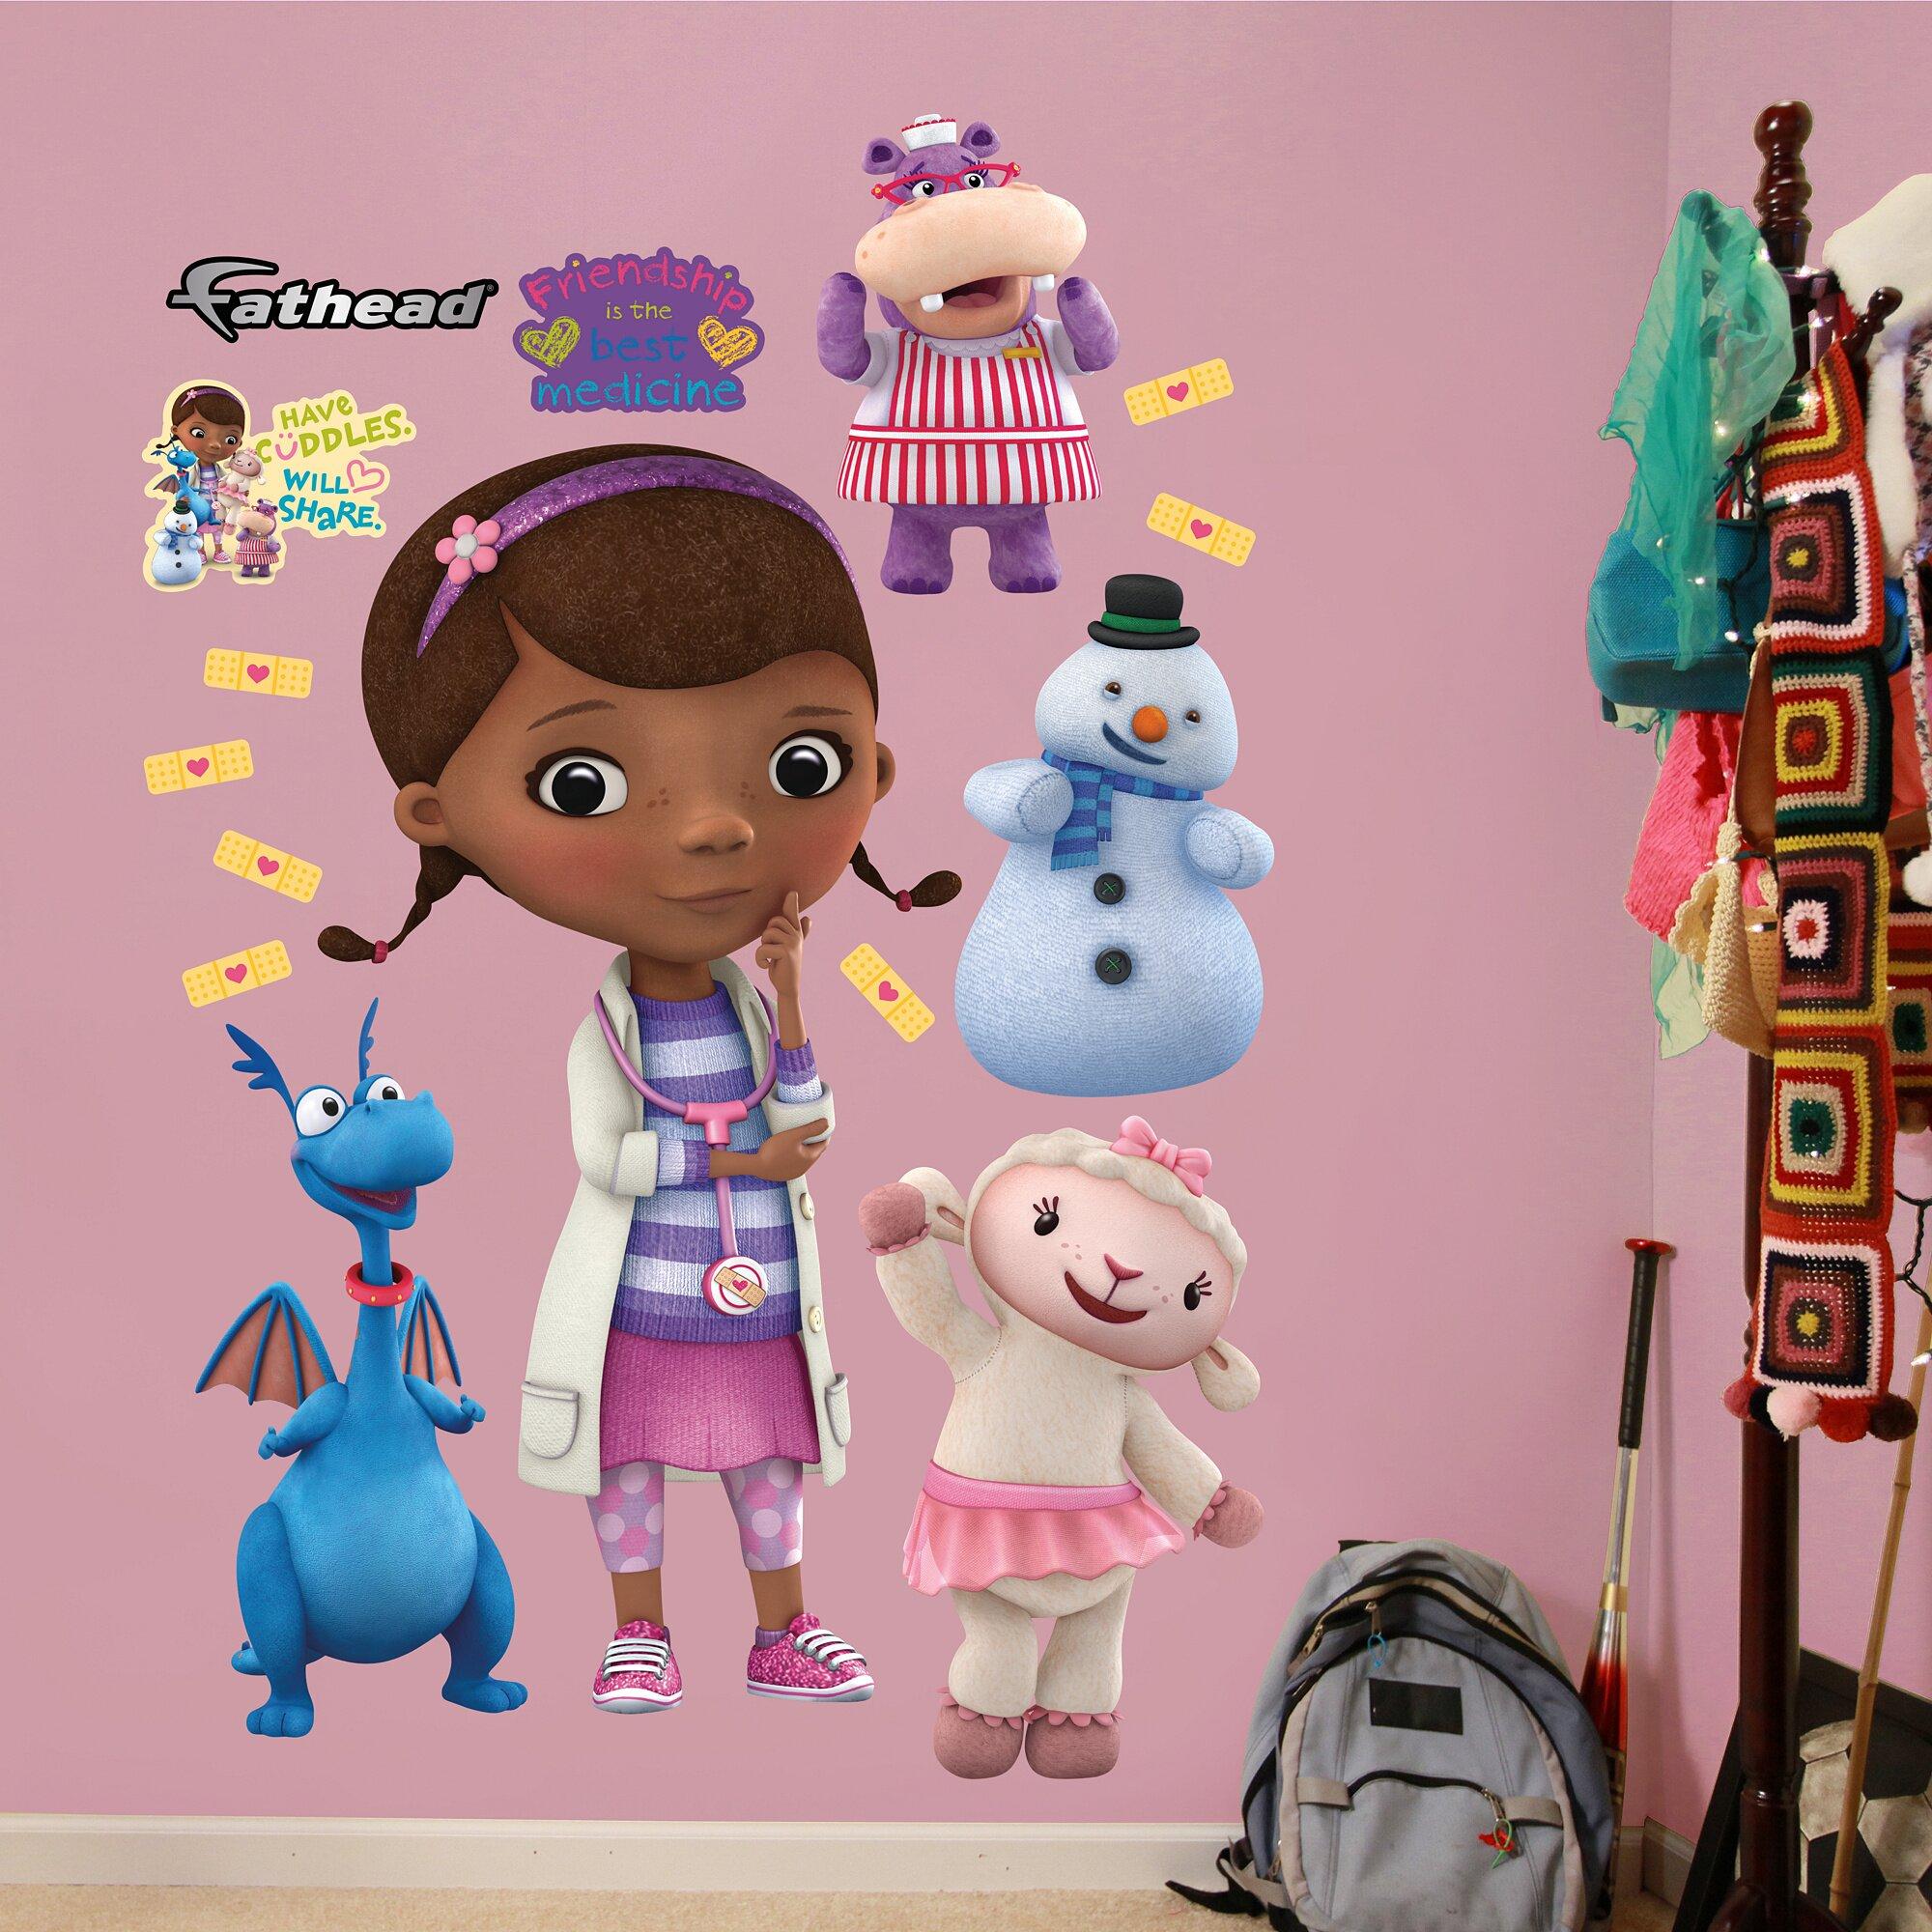 Fathead Disney Doc Mcstuffins Wall Decal Reviews Wayfair